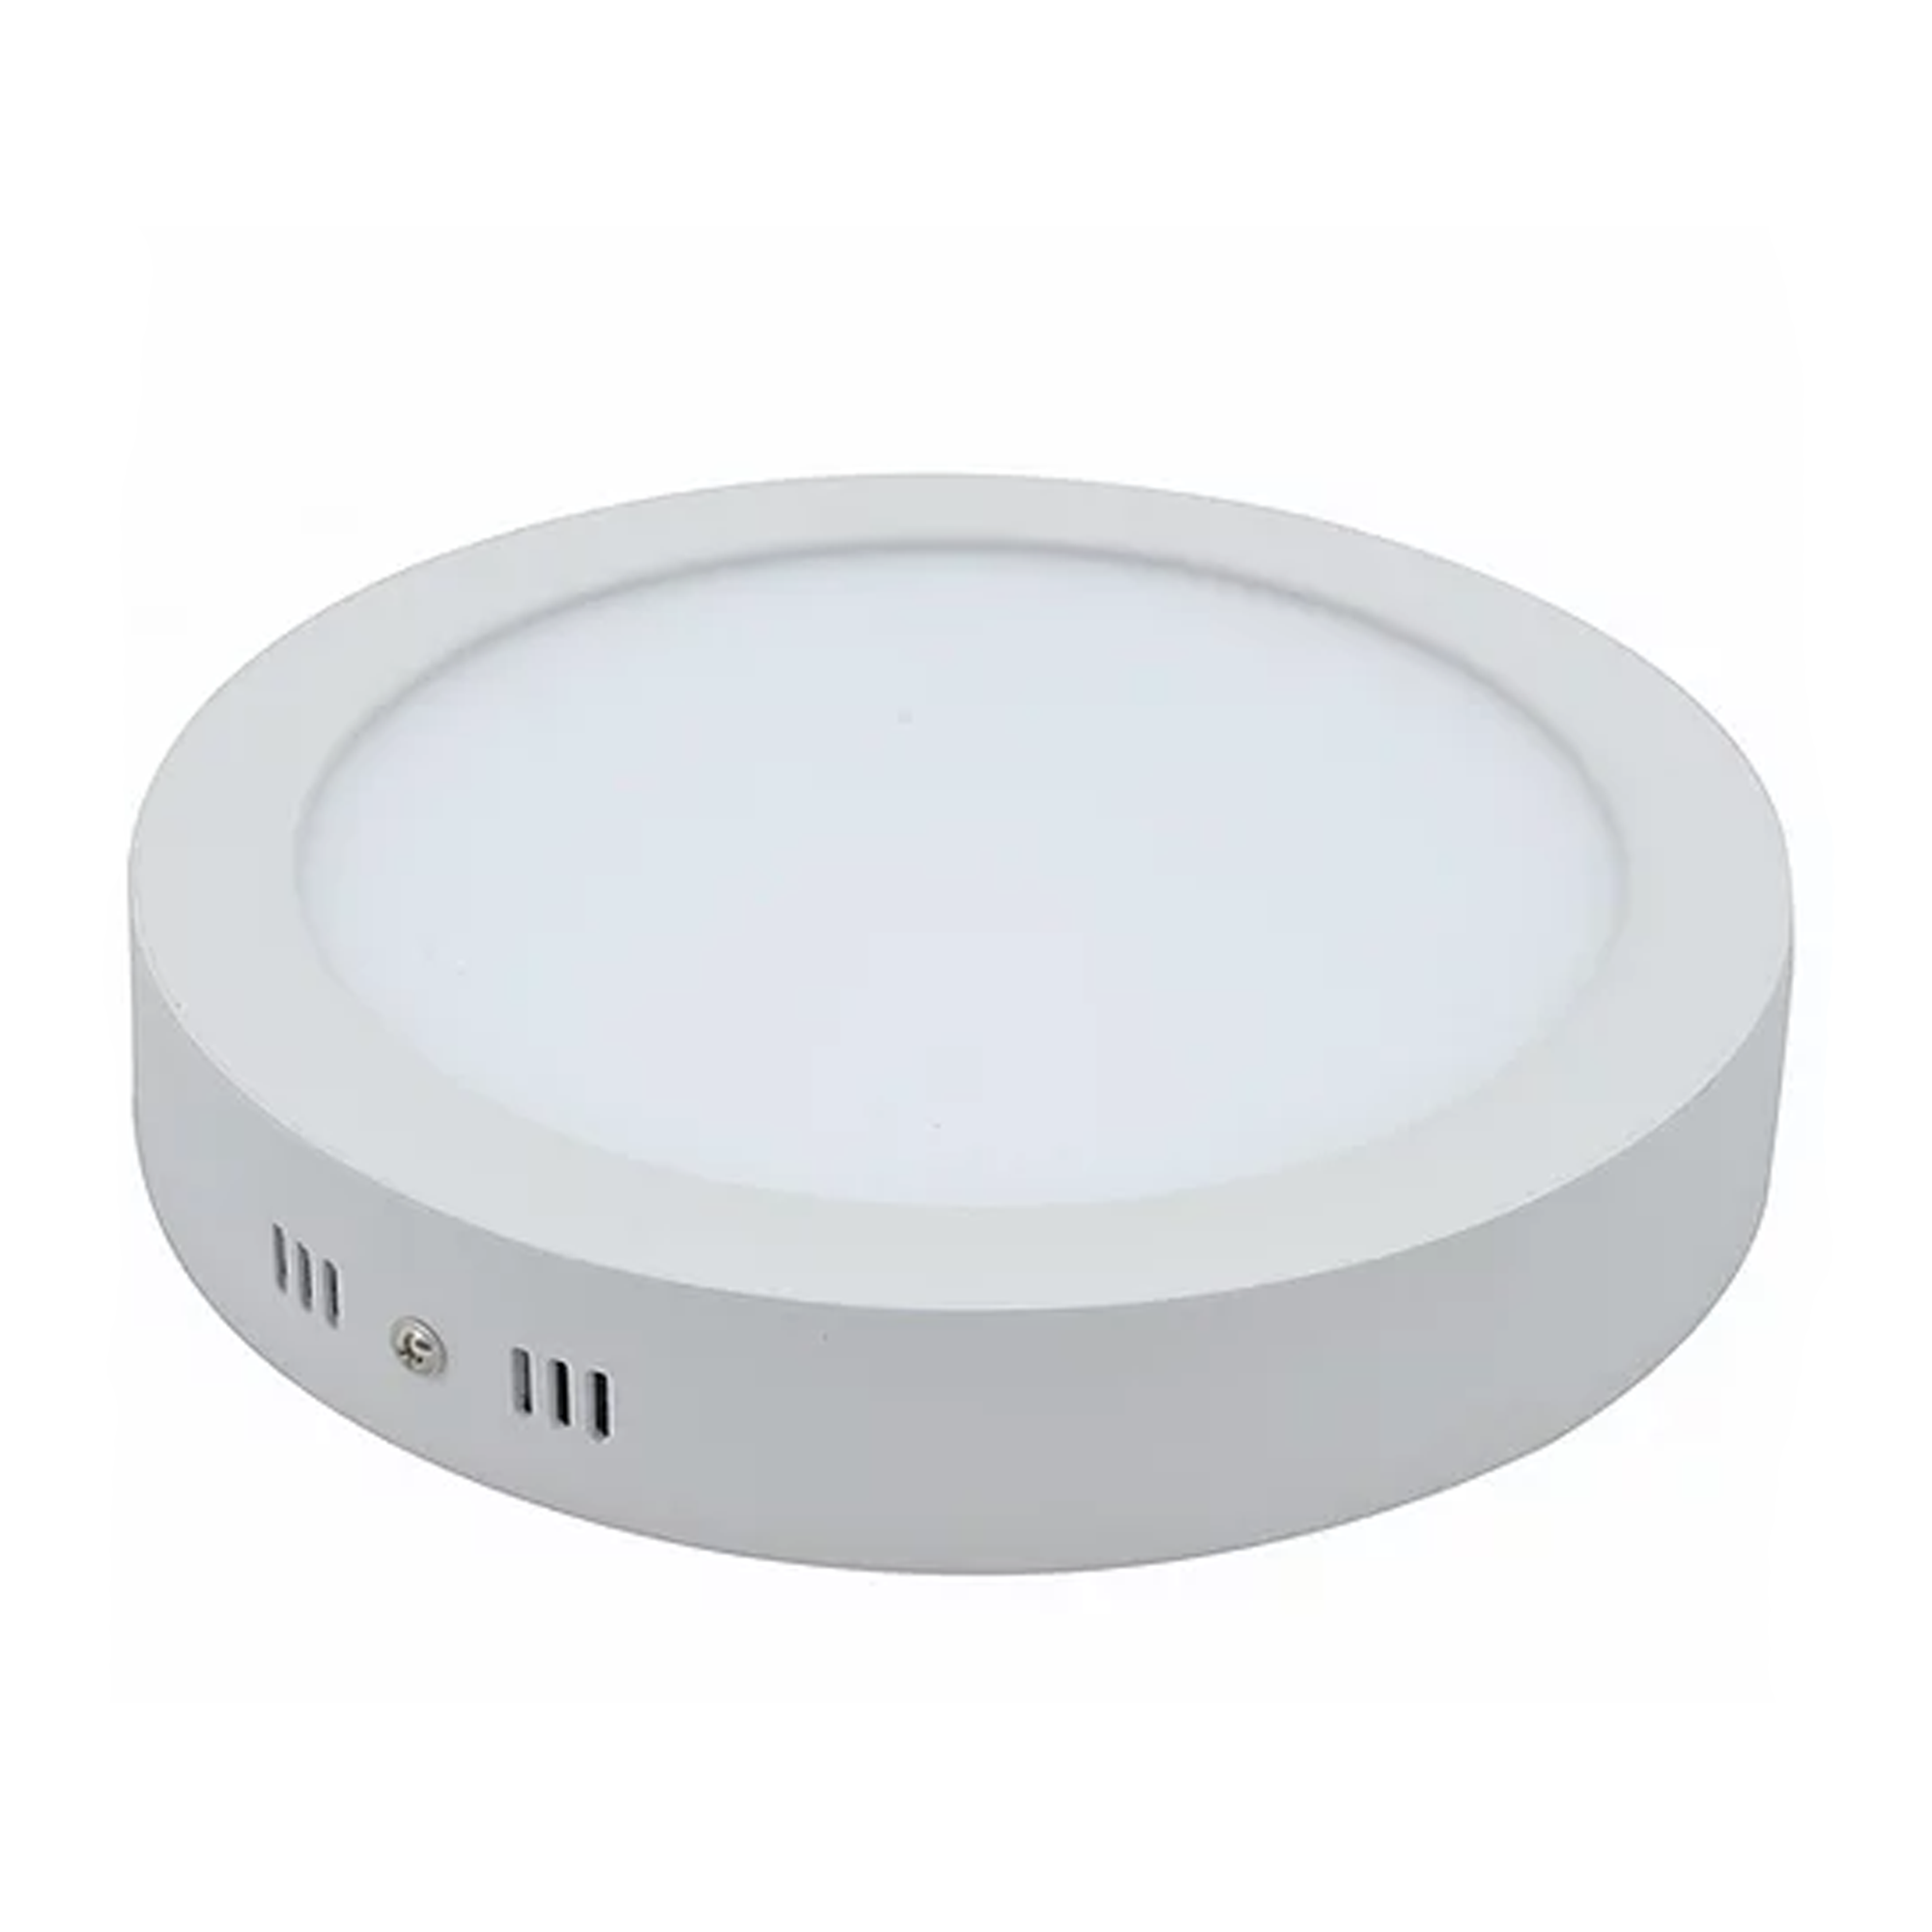 Plafon LED Sobrepor 32W Redondo / Branco Frio